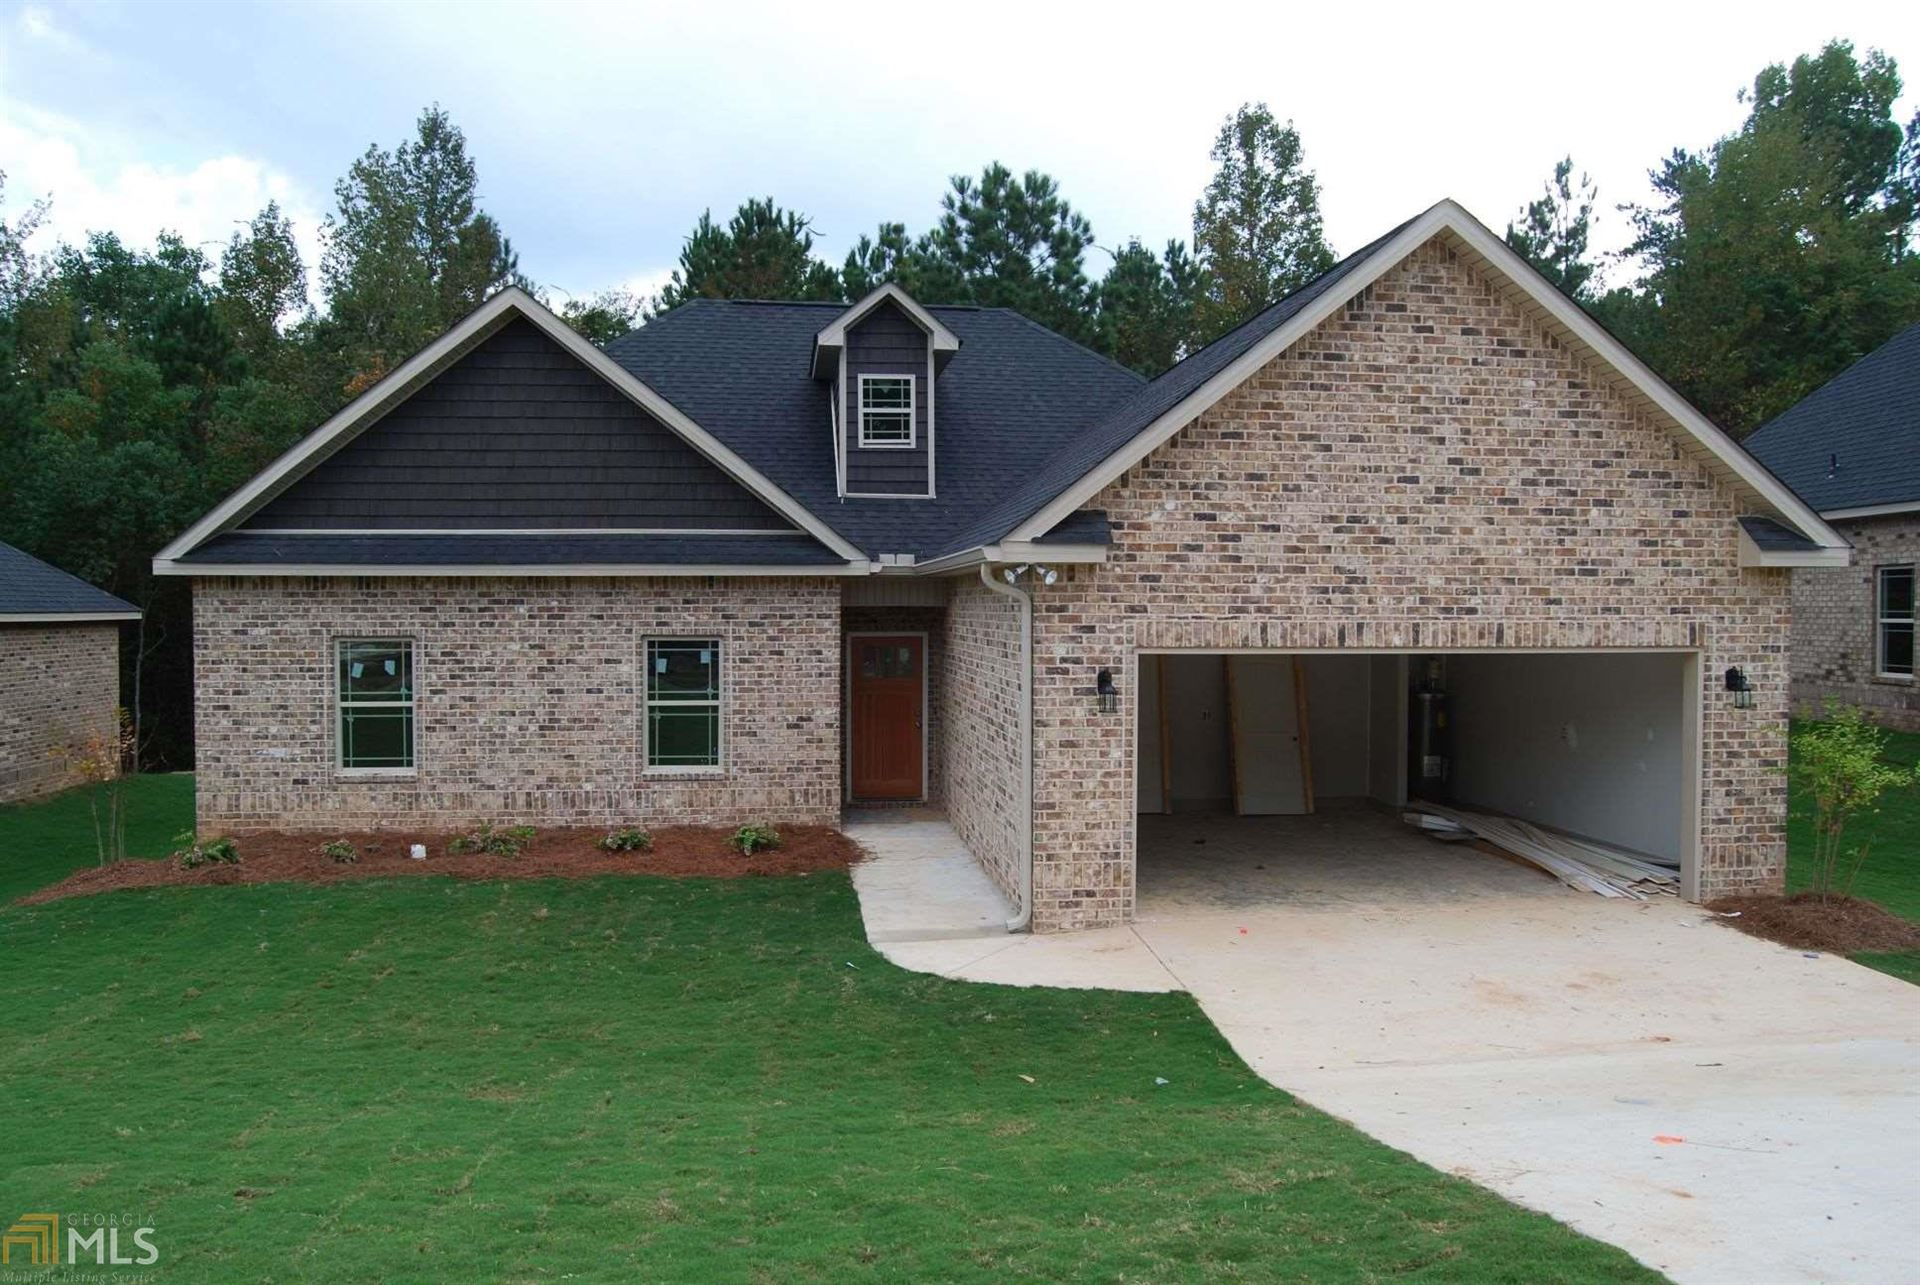 158 Summer Grove Ln, Macon, GA 31206 - MLS#: 8758920